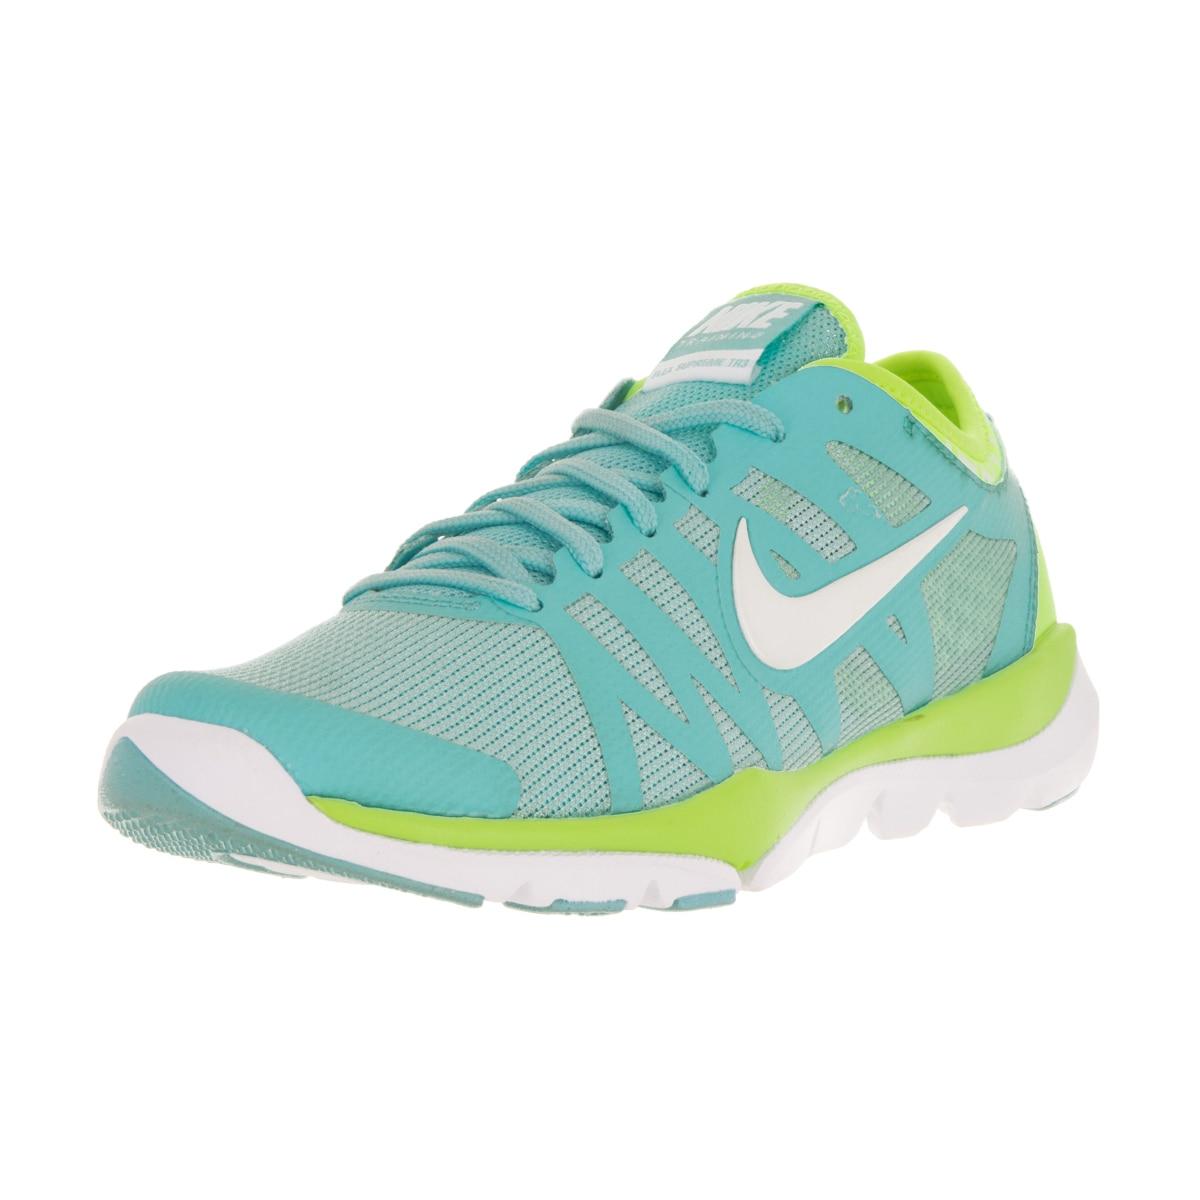 bolígrafo lote sufrir  Shop Nike Women's Flex Supreme Tr 3 Blue Training Shoe - Overstock -  14781000